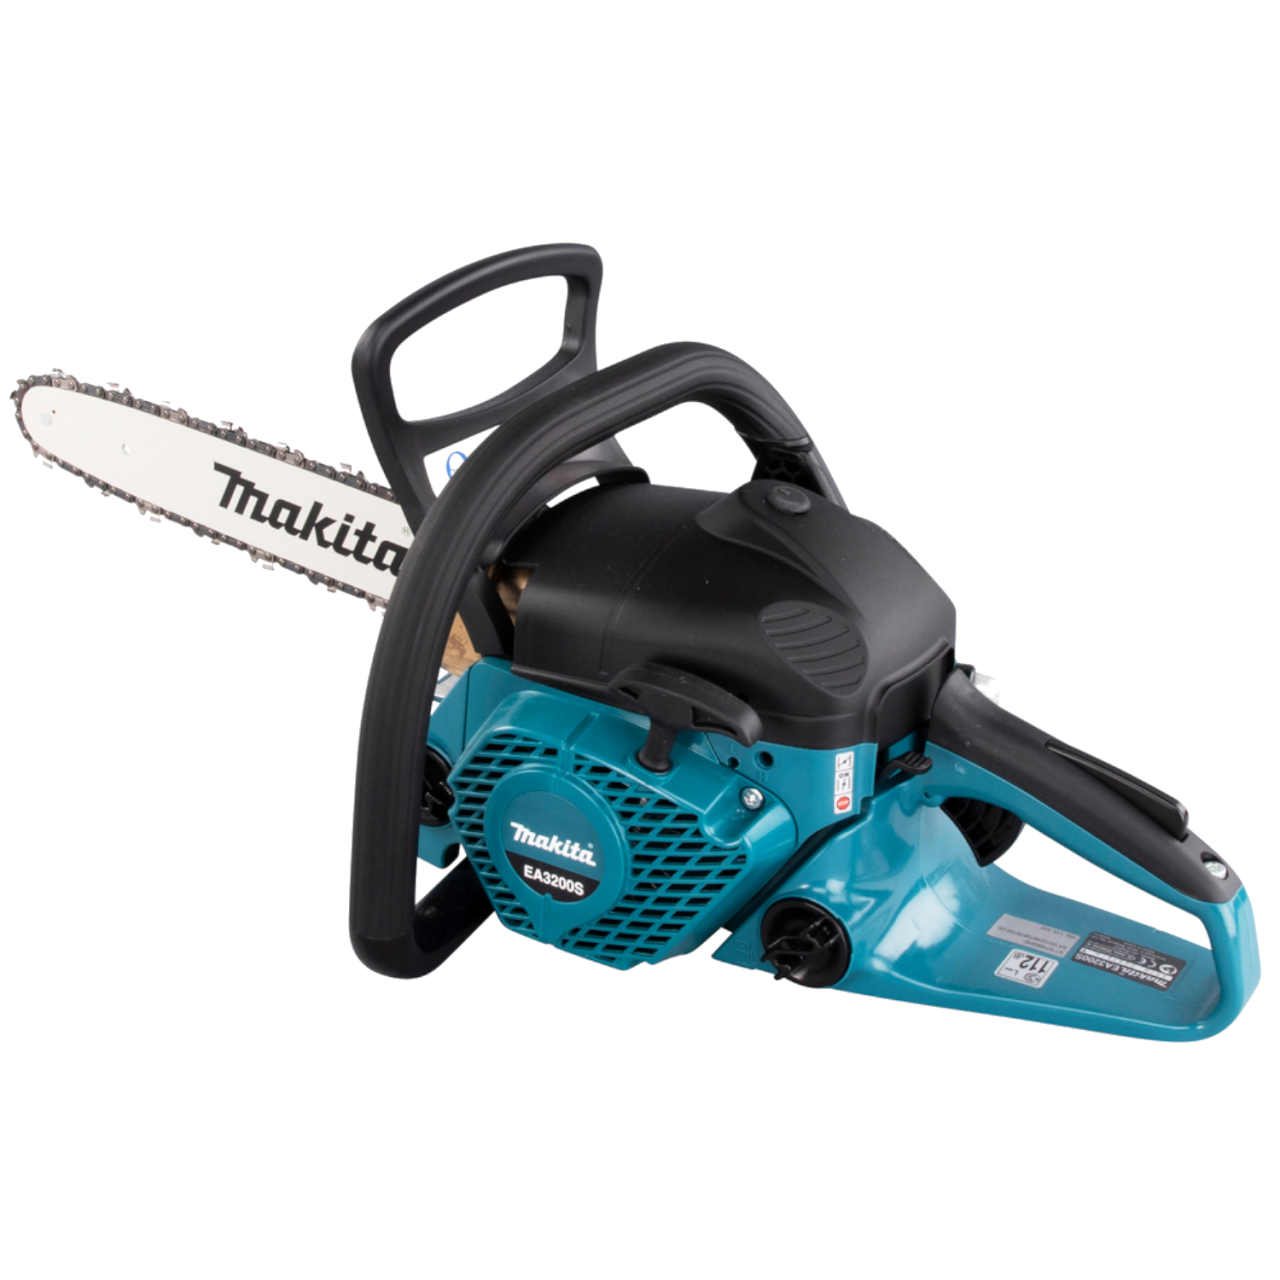 Makita Benzin-Kettensäge EA3200S35A Motorsäge Kettensäge 35cm 1,35kW/1,8PS Motor